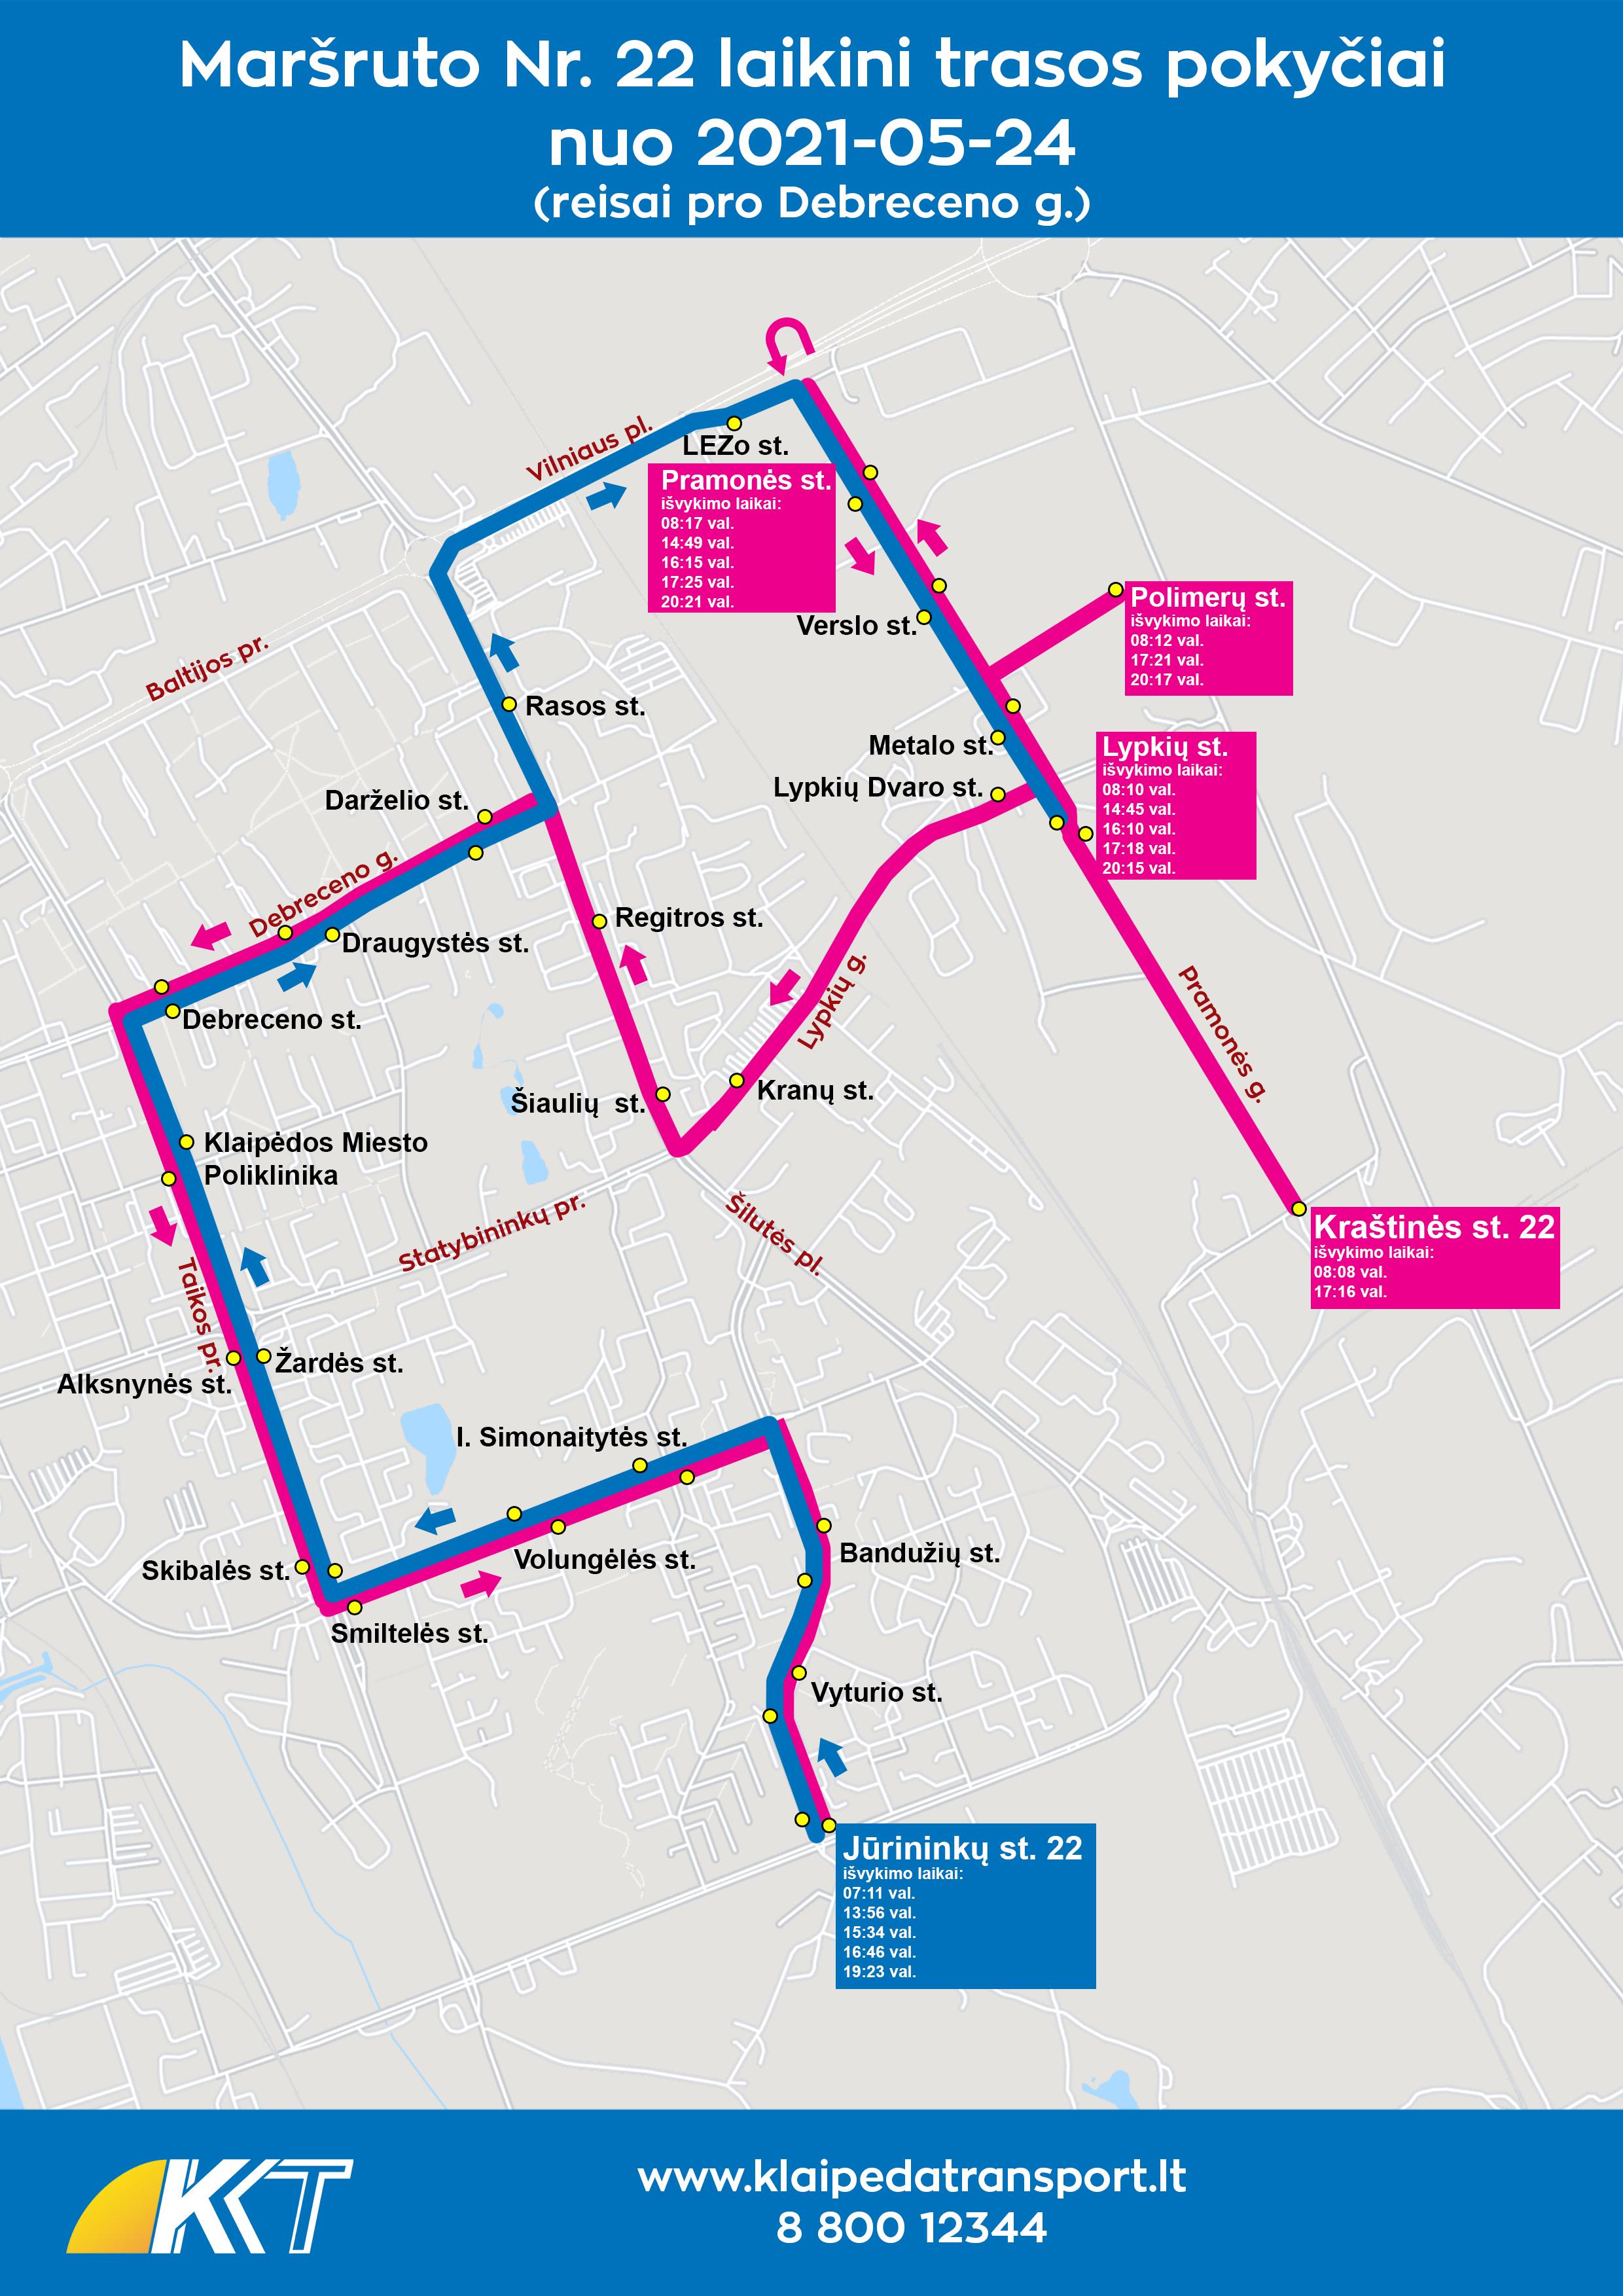 22 maršrutas per Lypkių g. REISAS PRO DEBRECENO G. nuo 2021-05-24